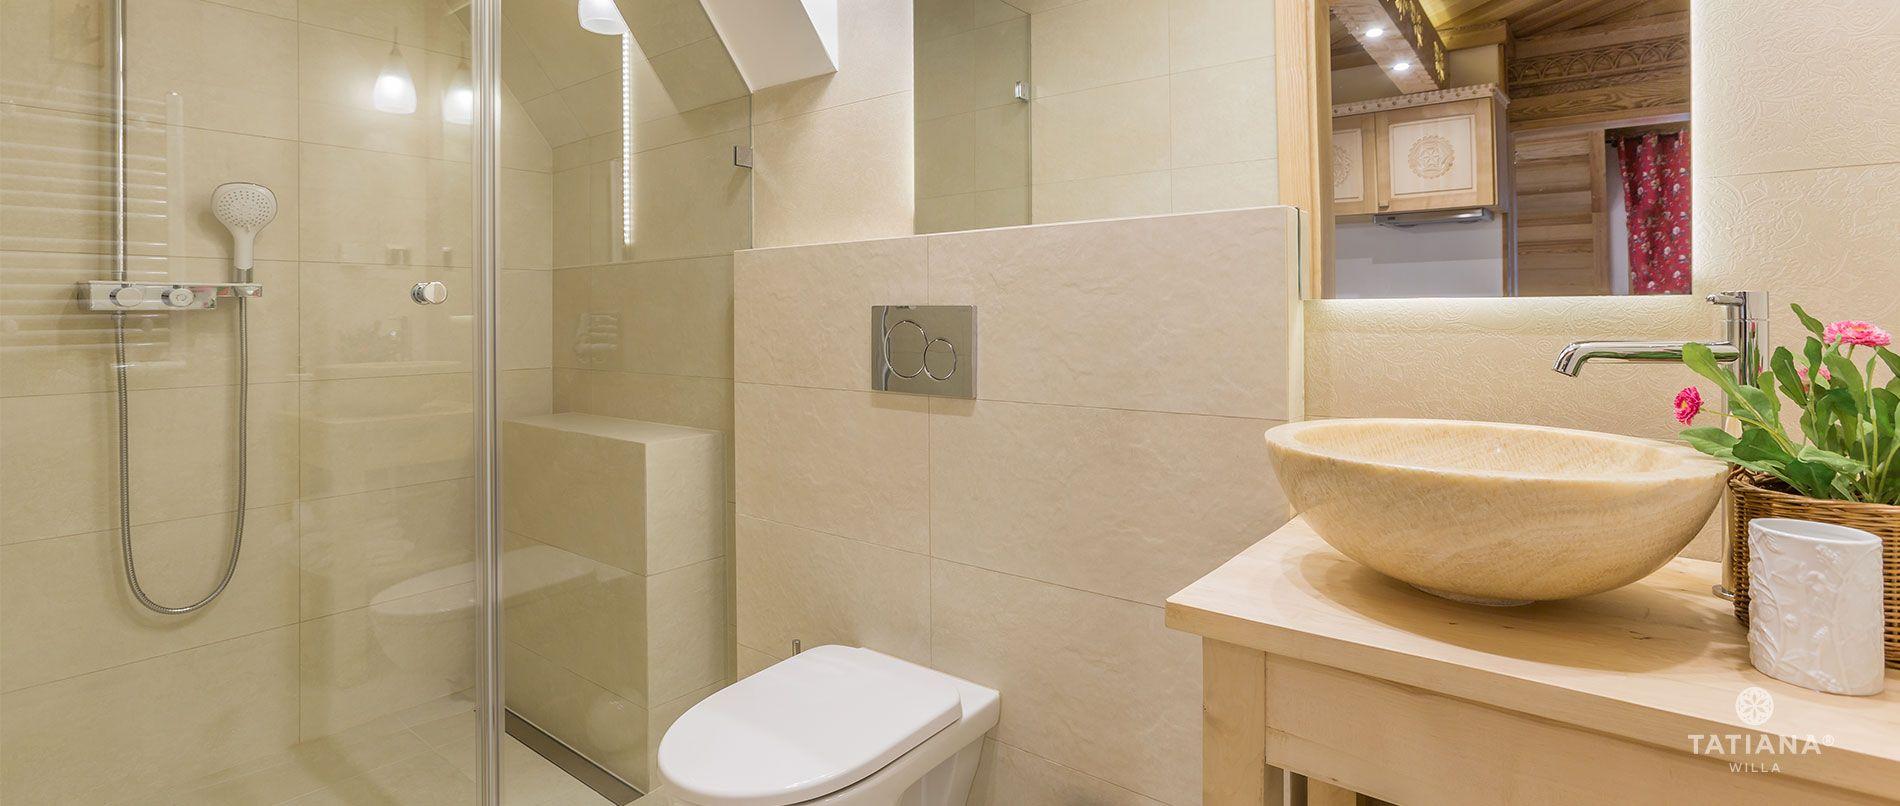 Tatra Apartment - Bathroom